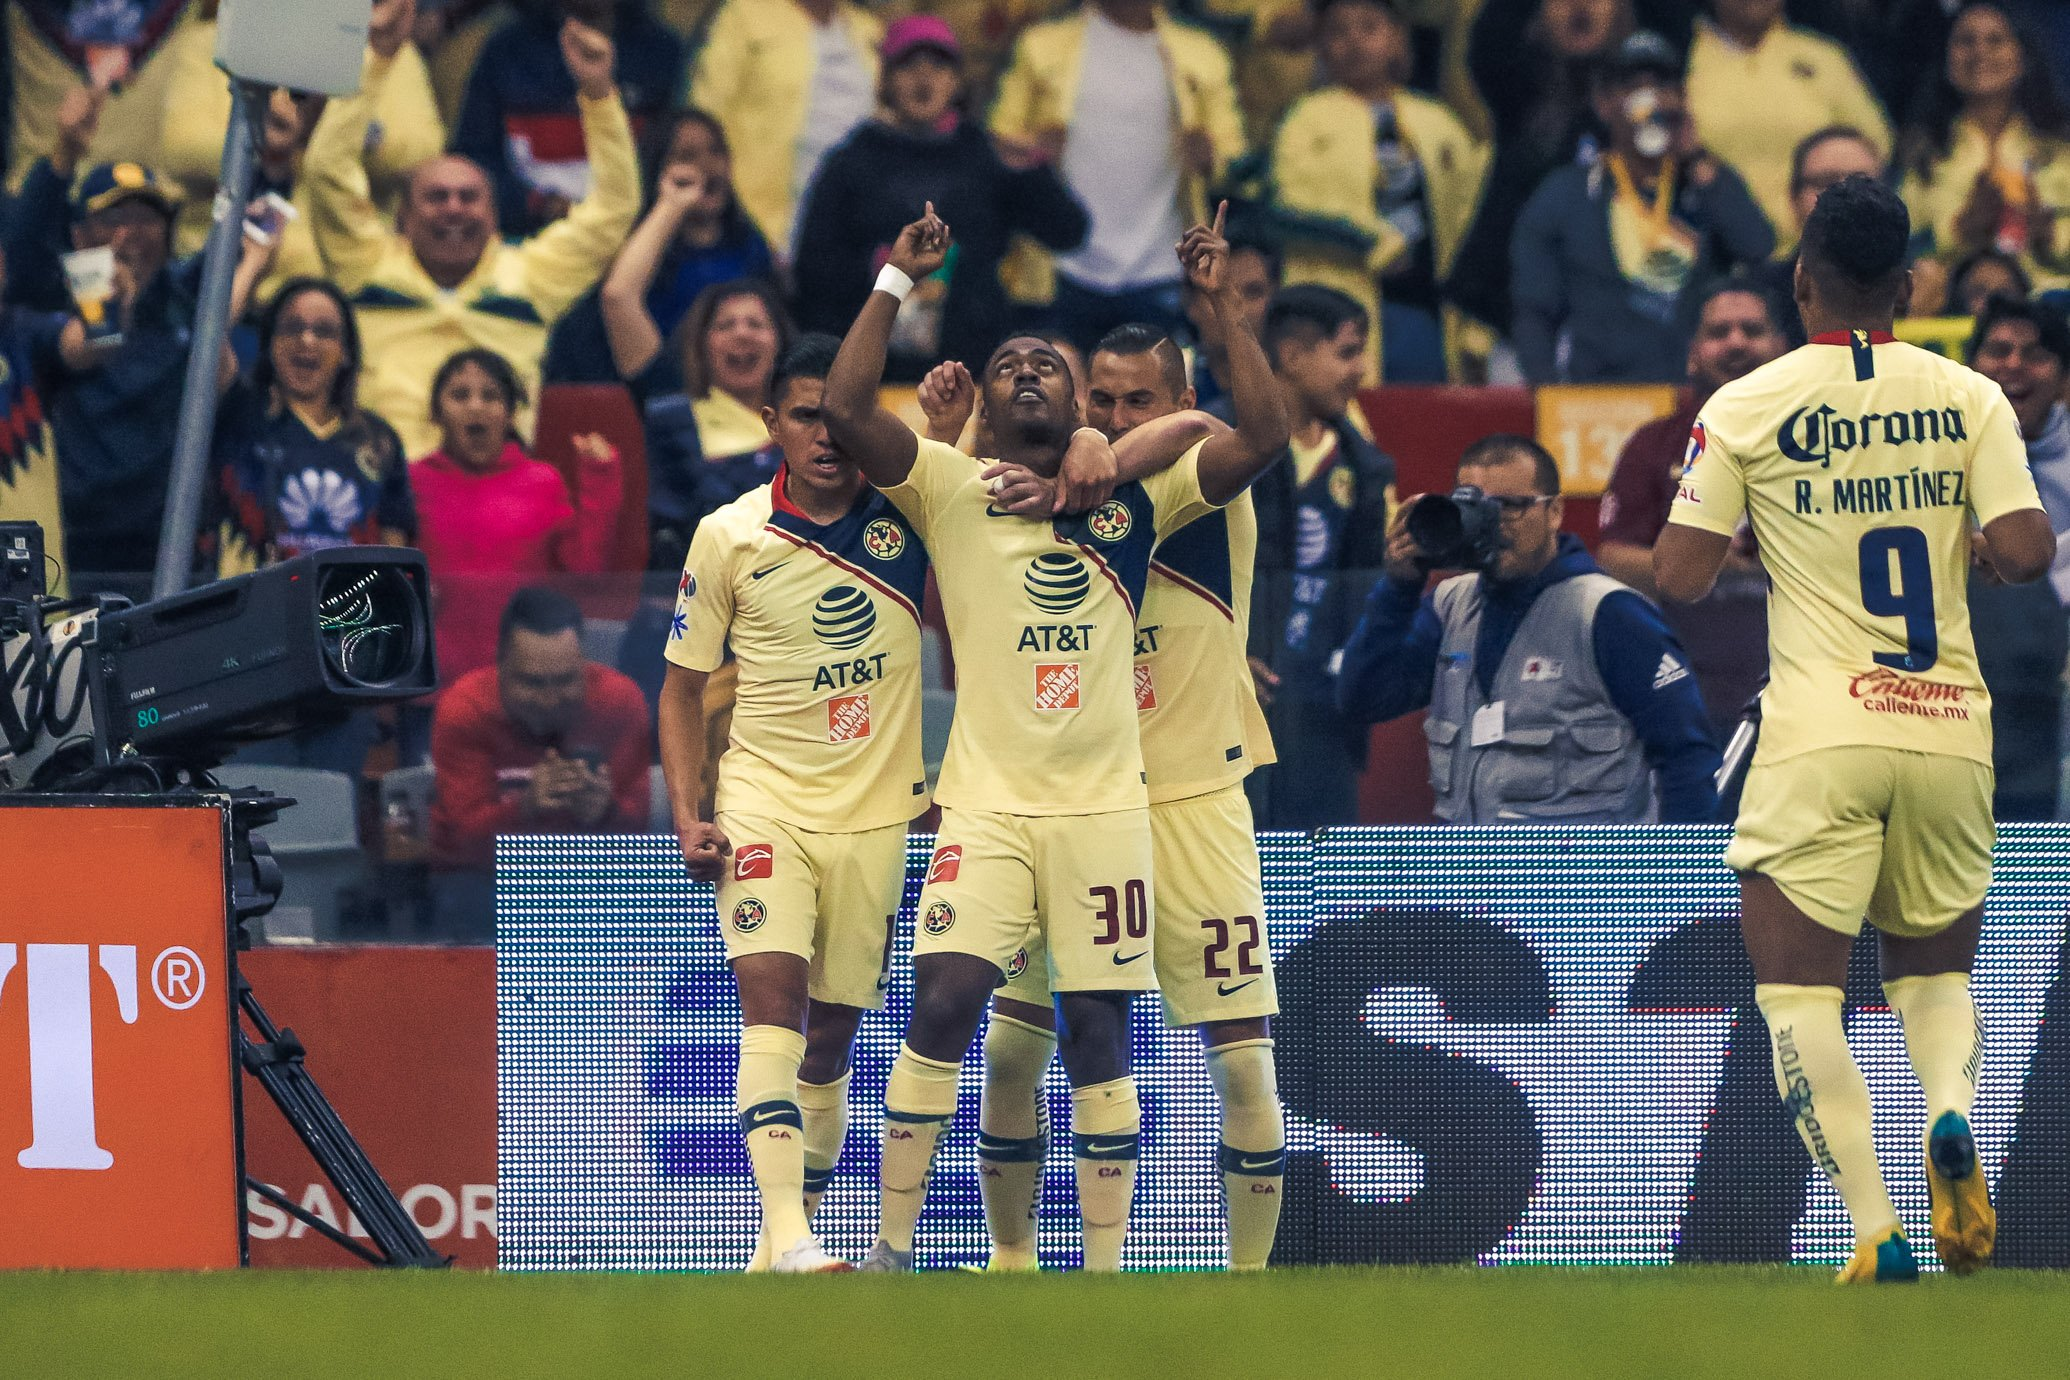 América disputará la final con Cruz Azul tras golear 6-1 a Pumas